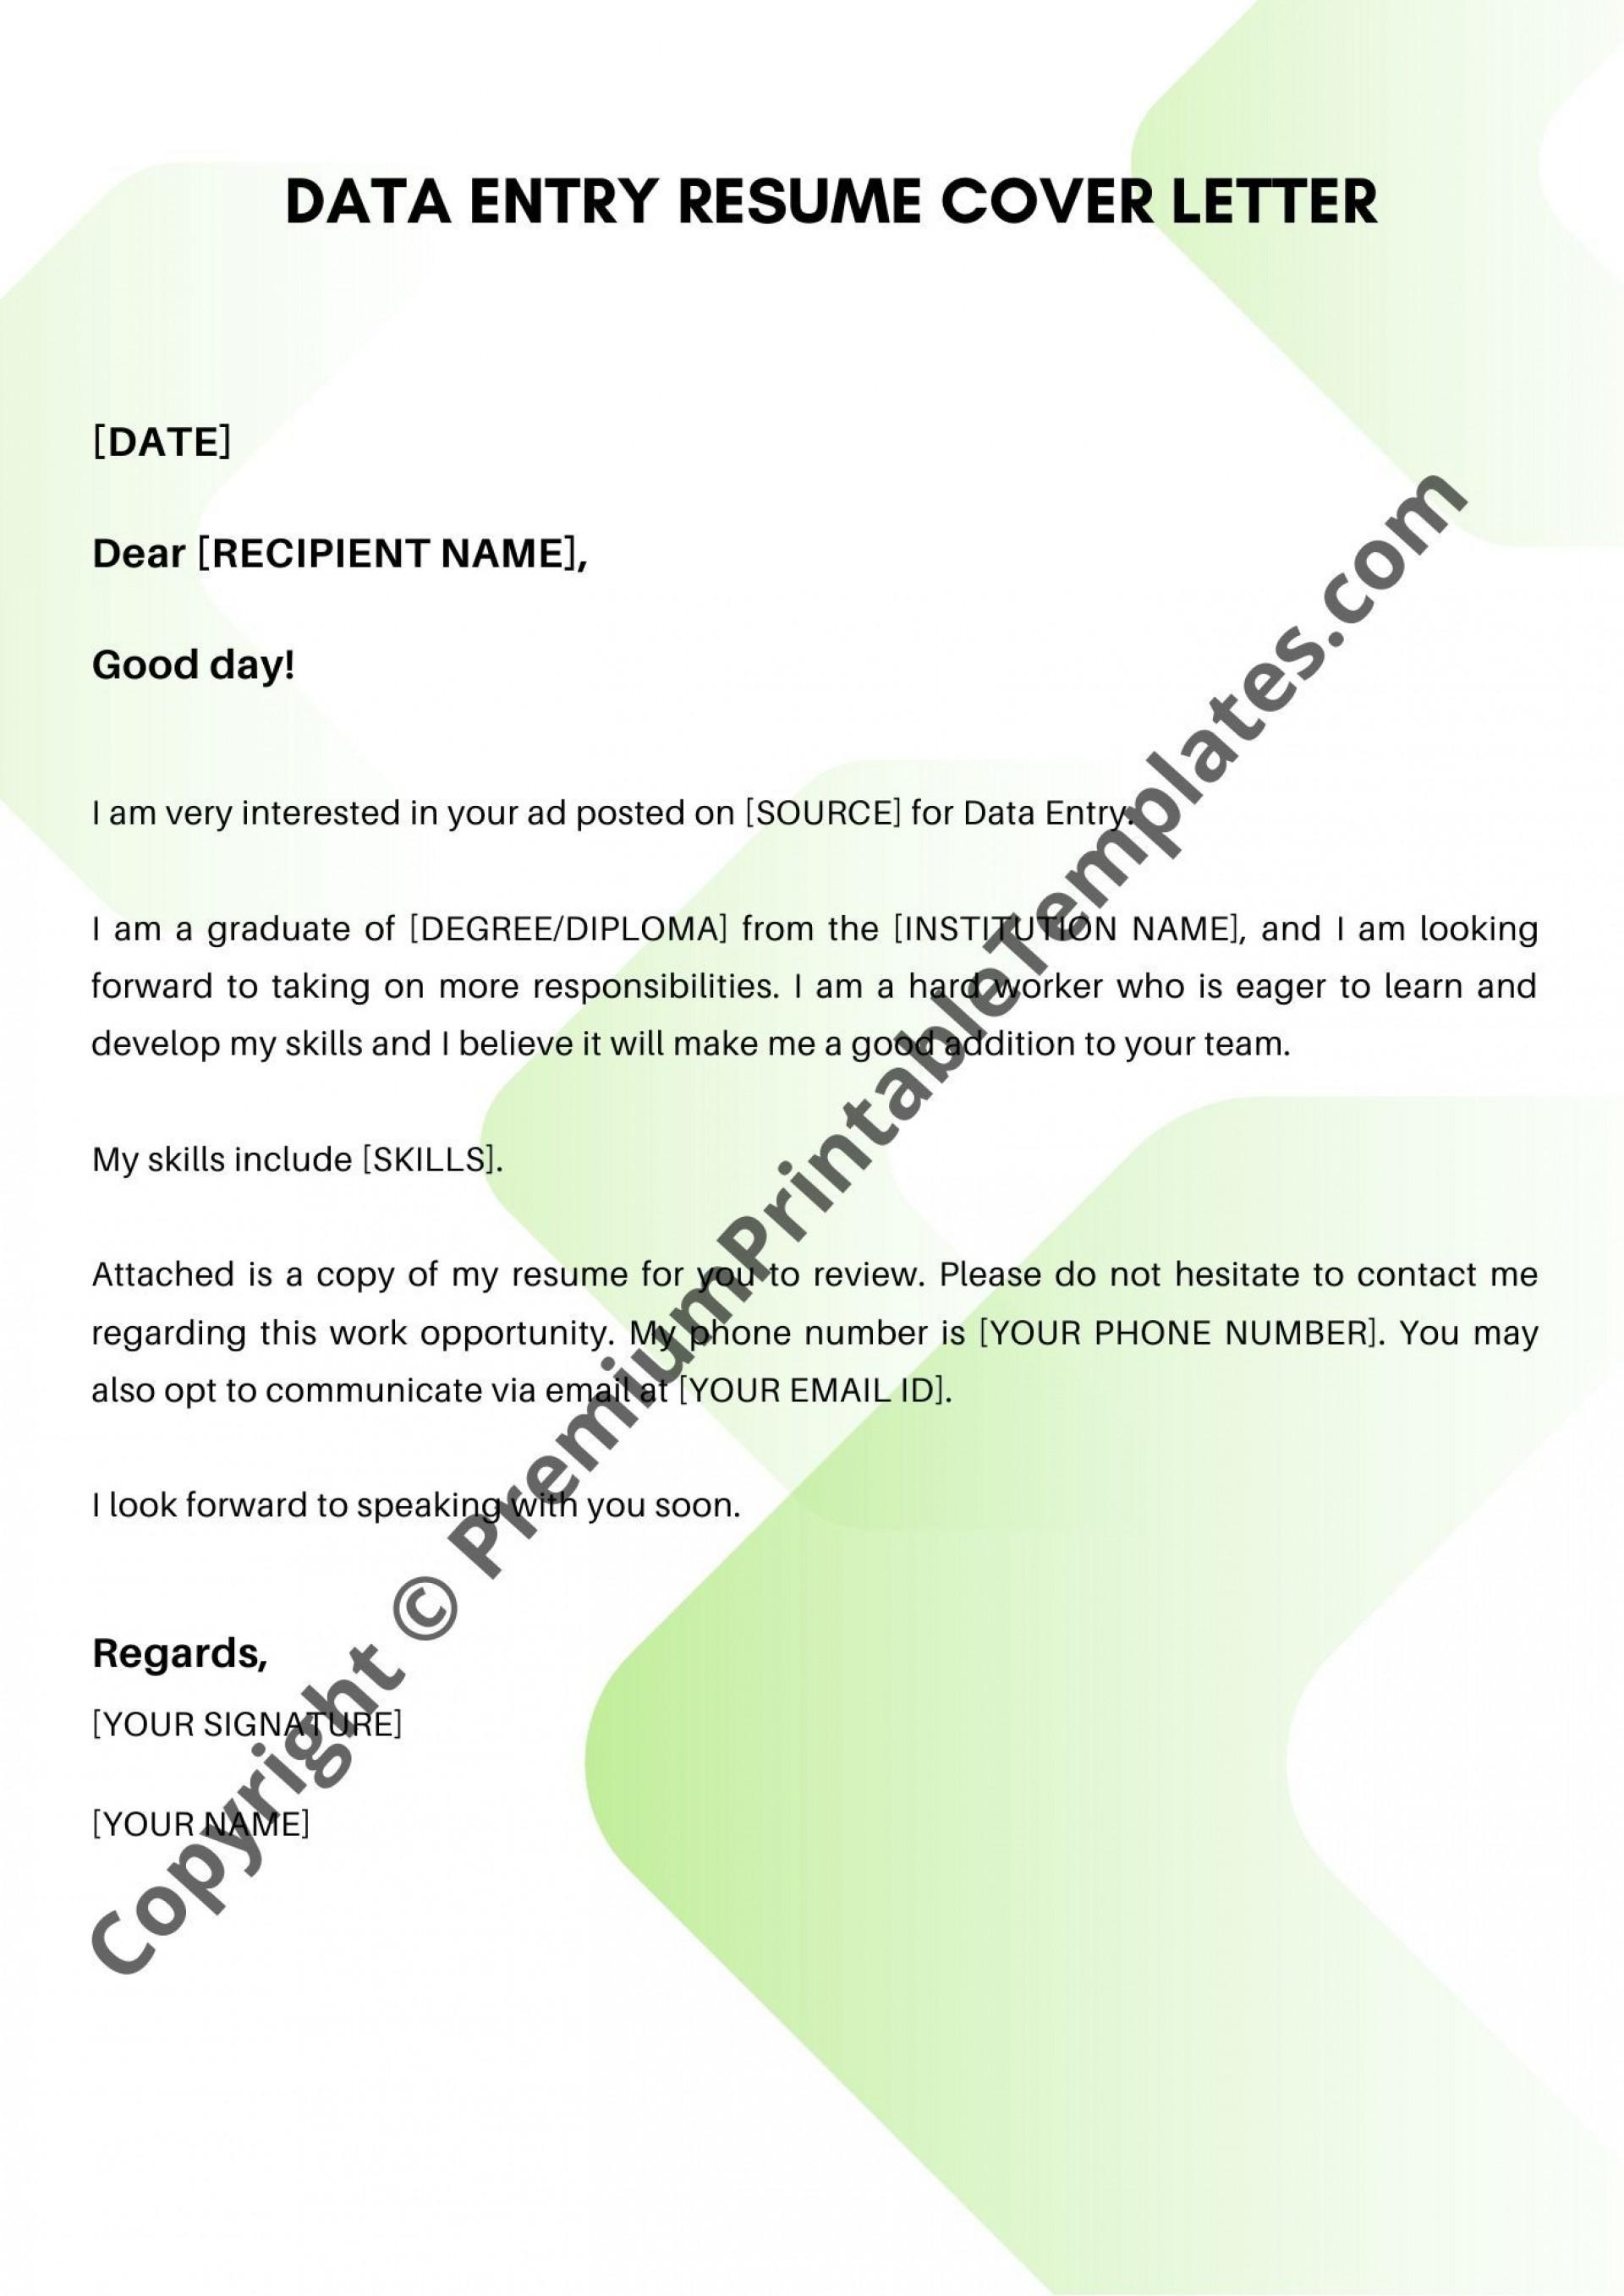 008 Sensational Simple Cover Letter Template Inspiration  For Resume Nz1920